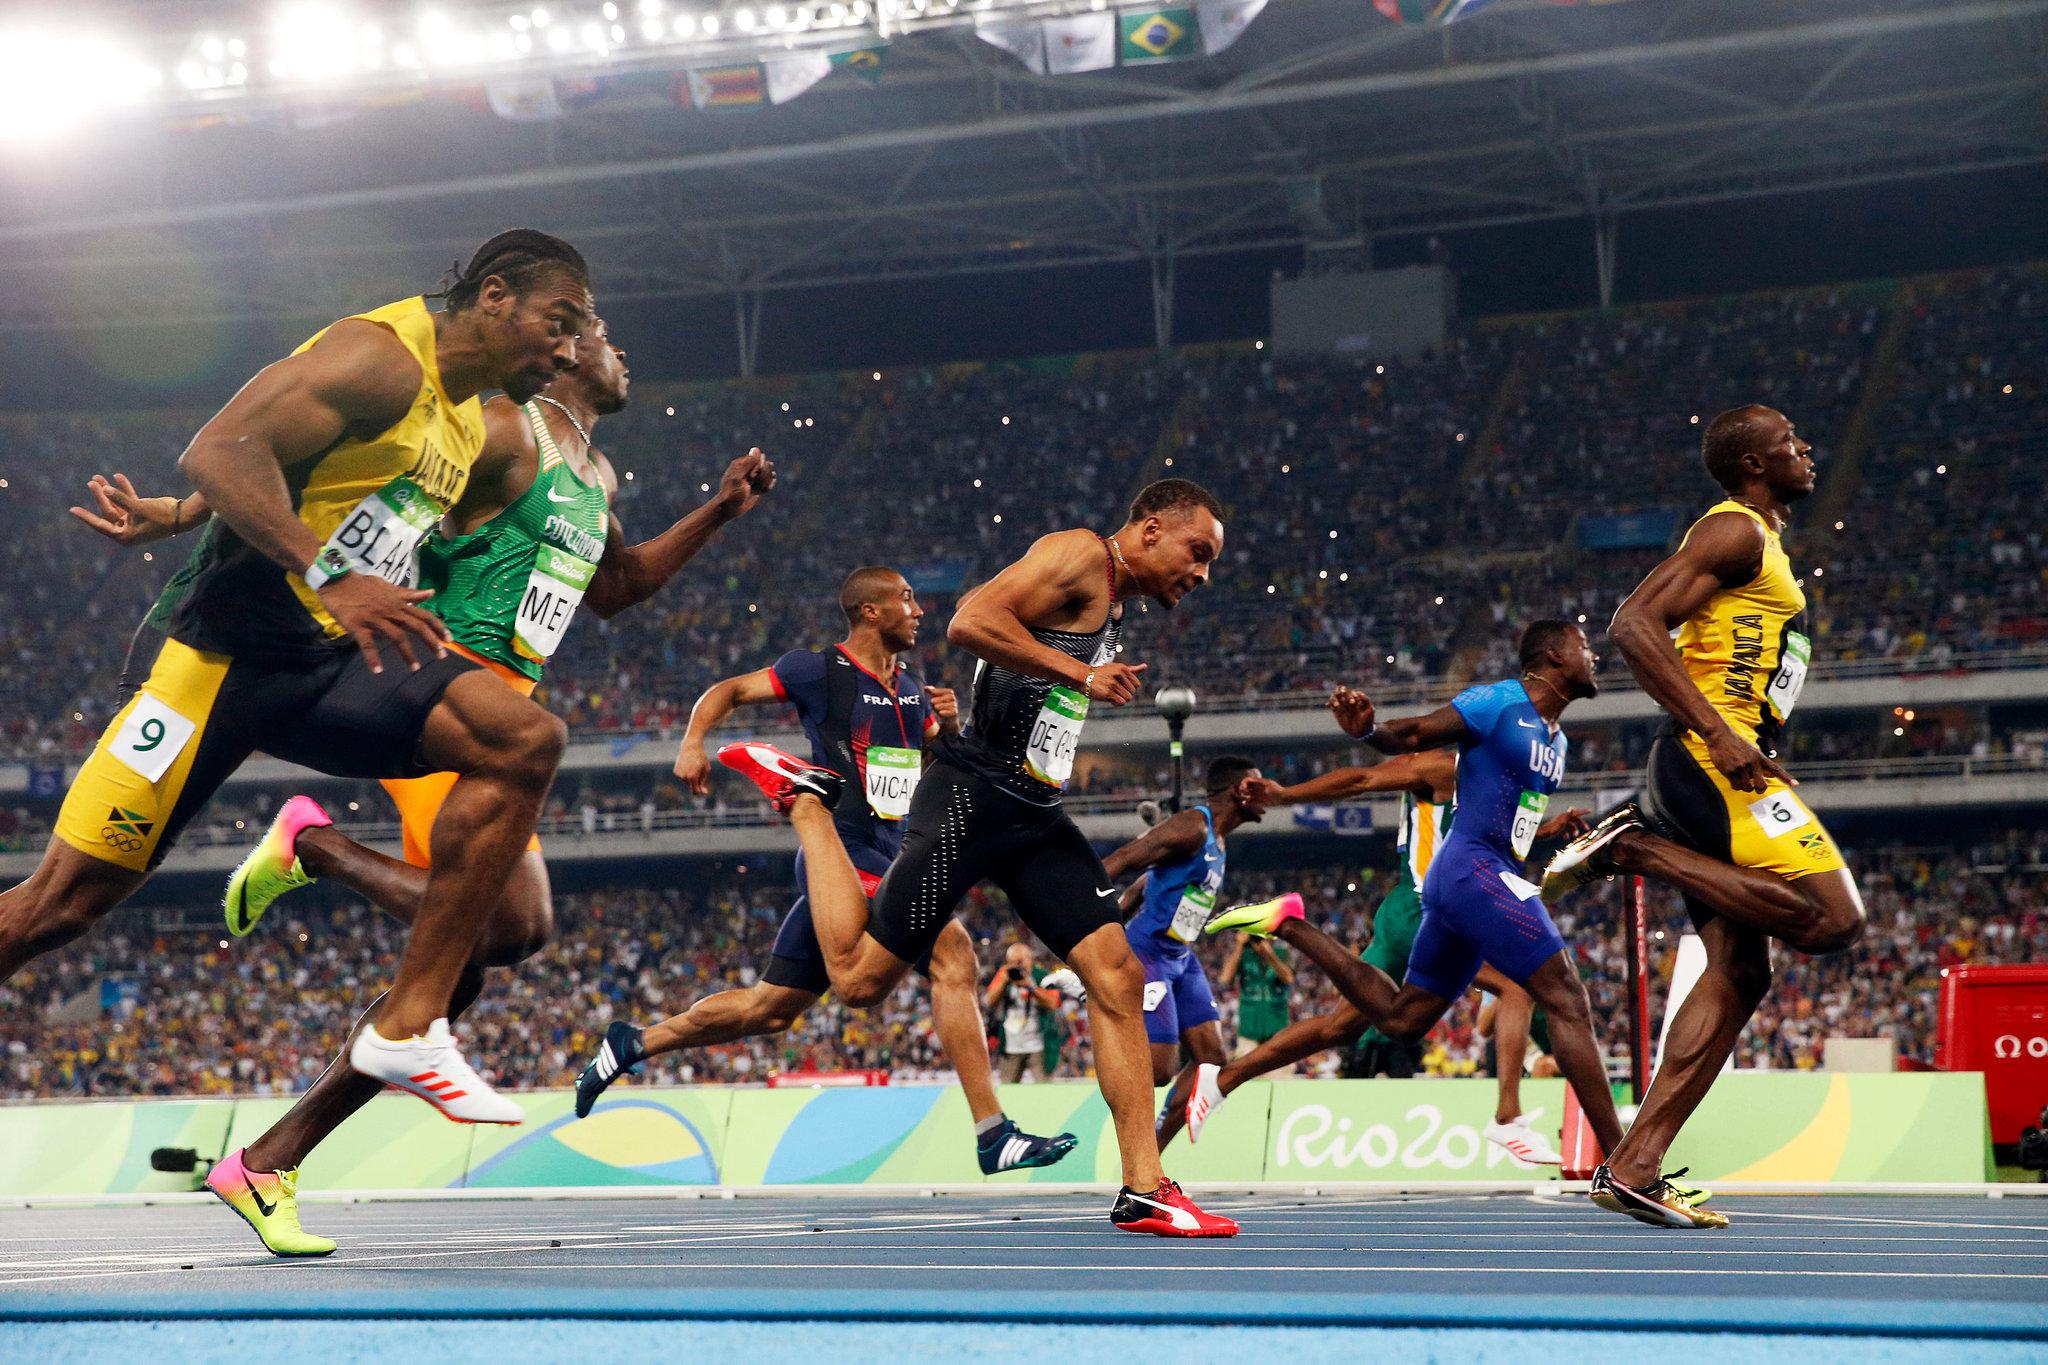 Usain Bolt Is Still the World's Fastest Man By JERÉ LONGMANAUG. 14, 2016 Photo